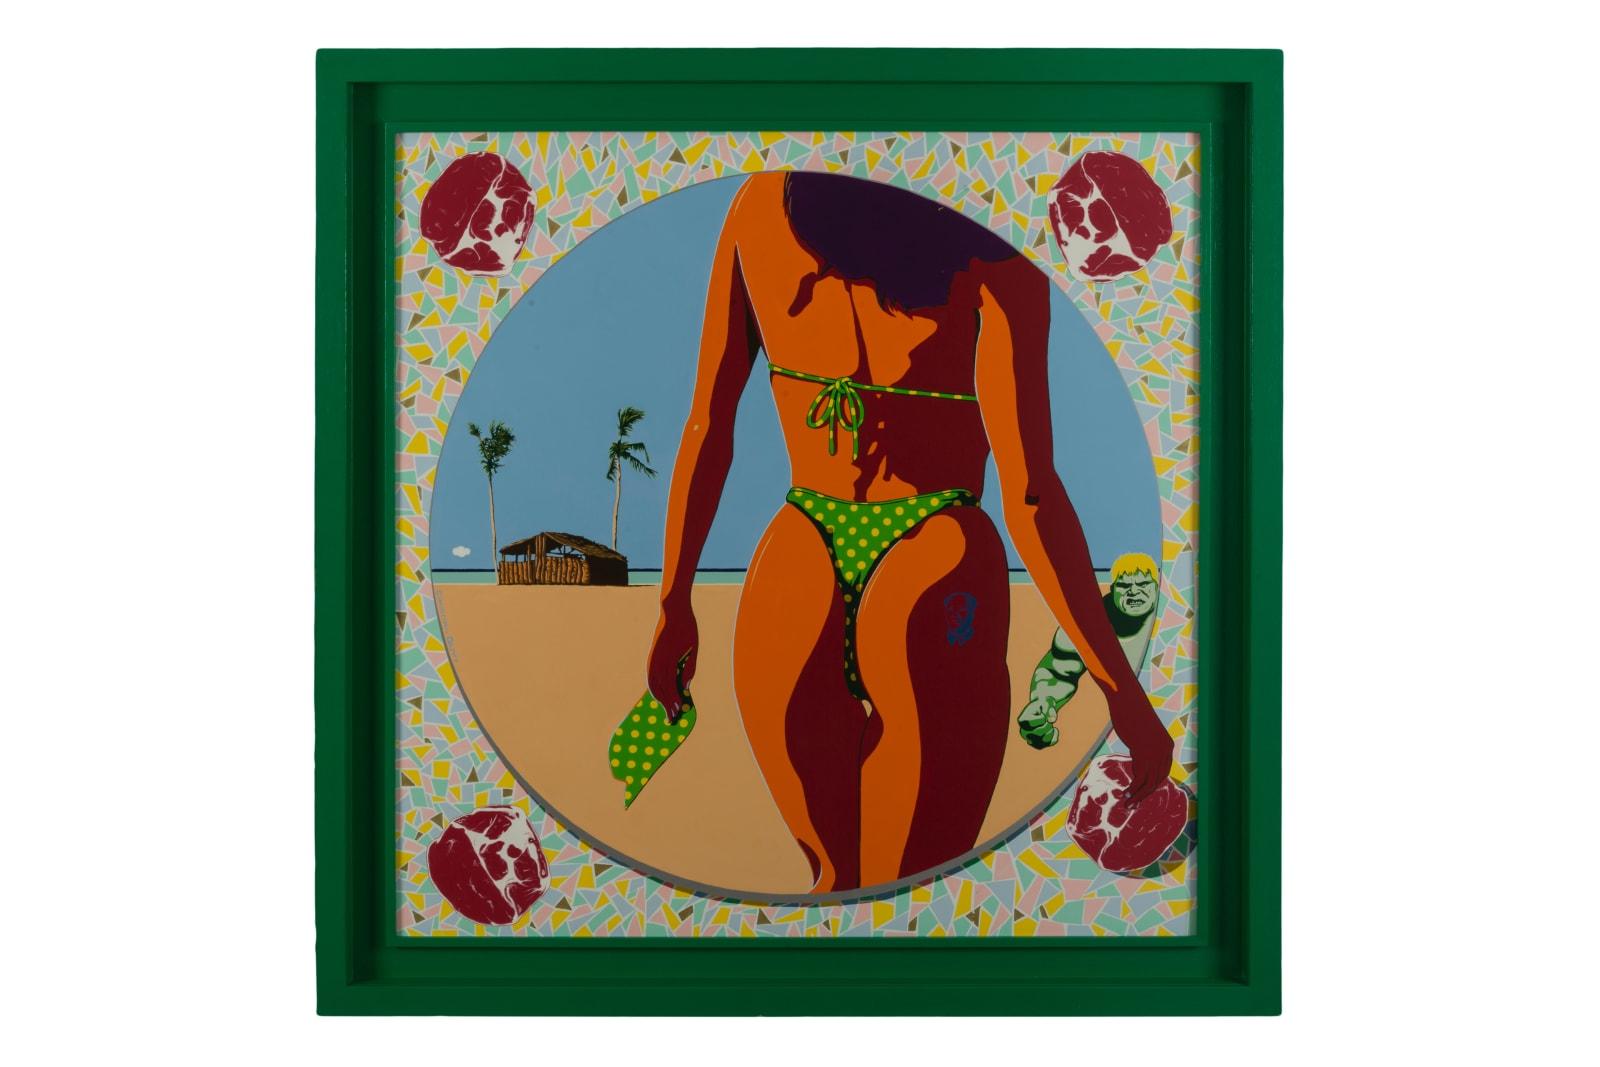 Christian Guy, Coppa Cabana (La belle en chair et la bete humane), 2005